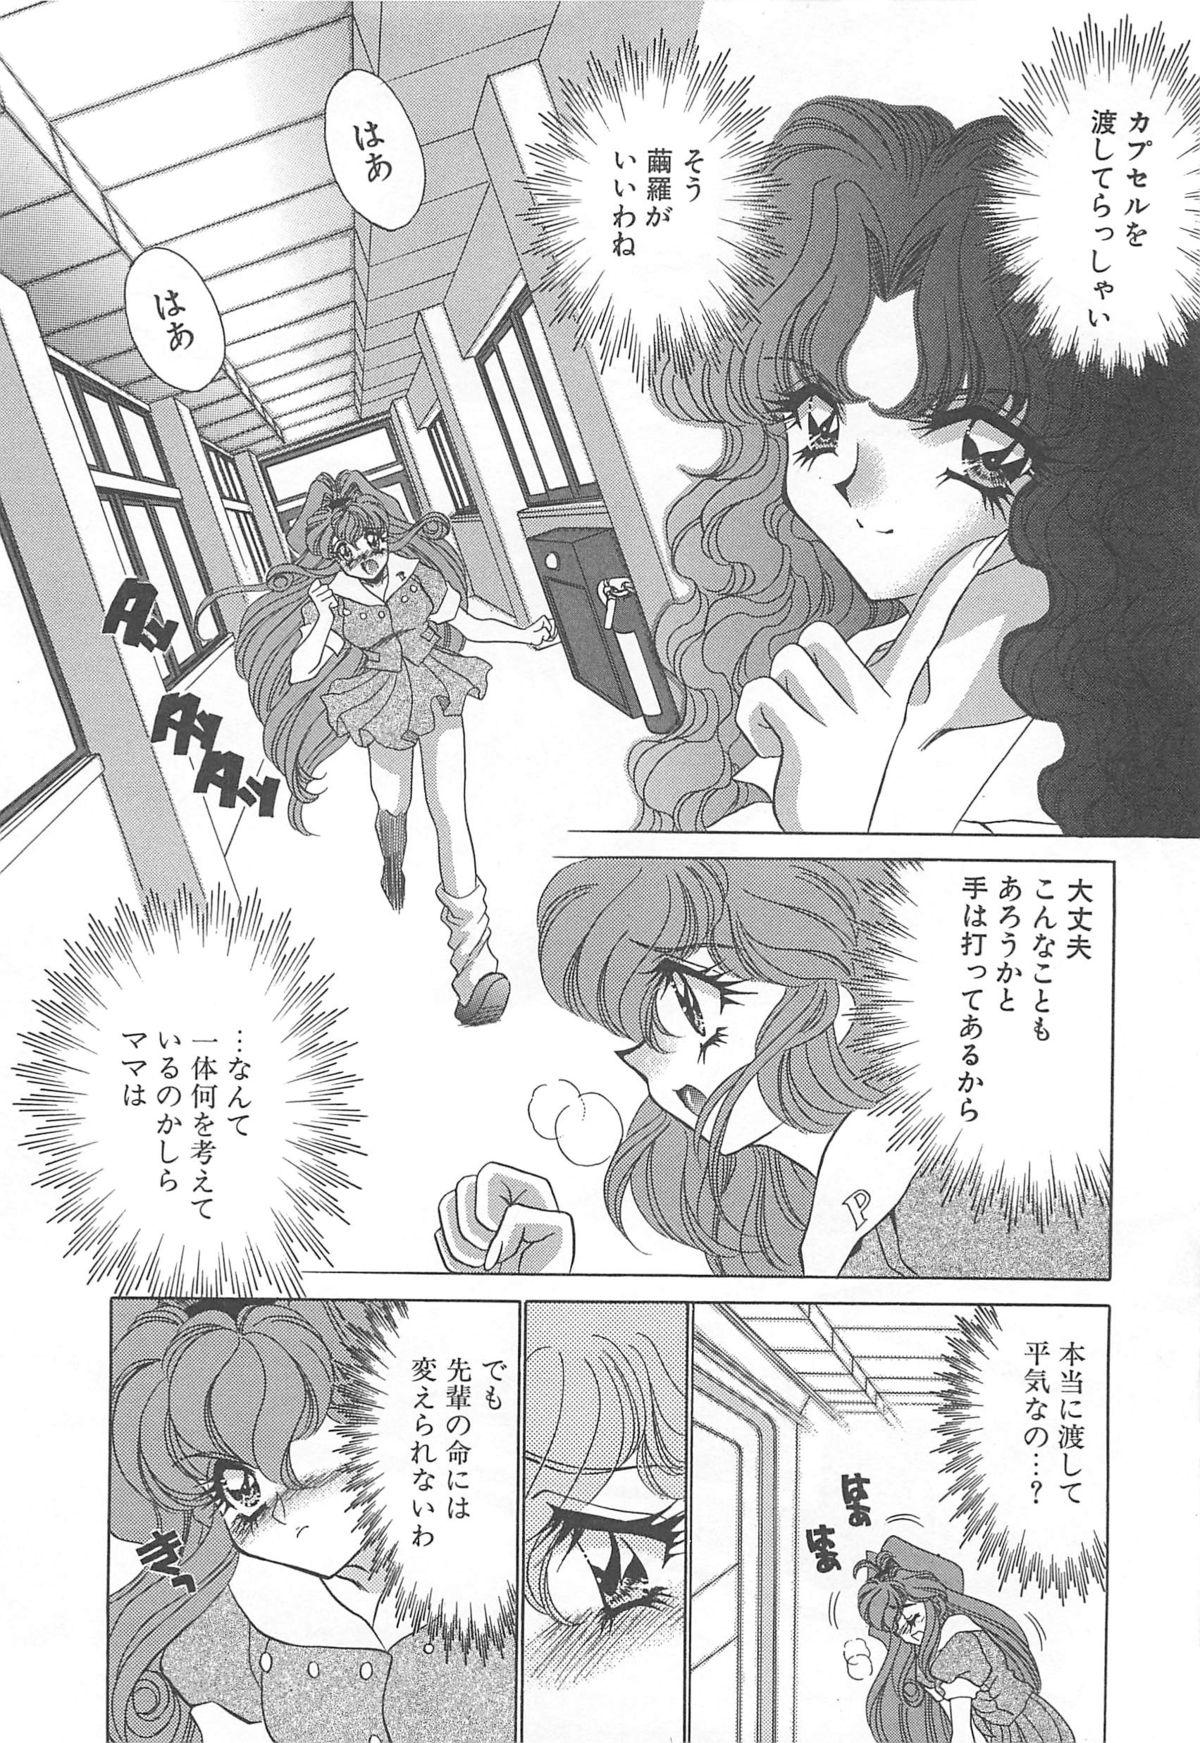 Kigurumi Sentai Quiltian 186